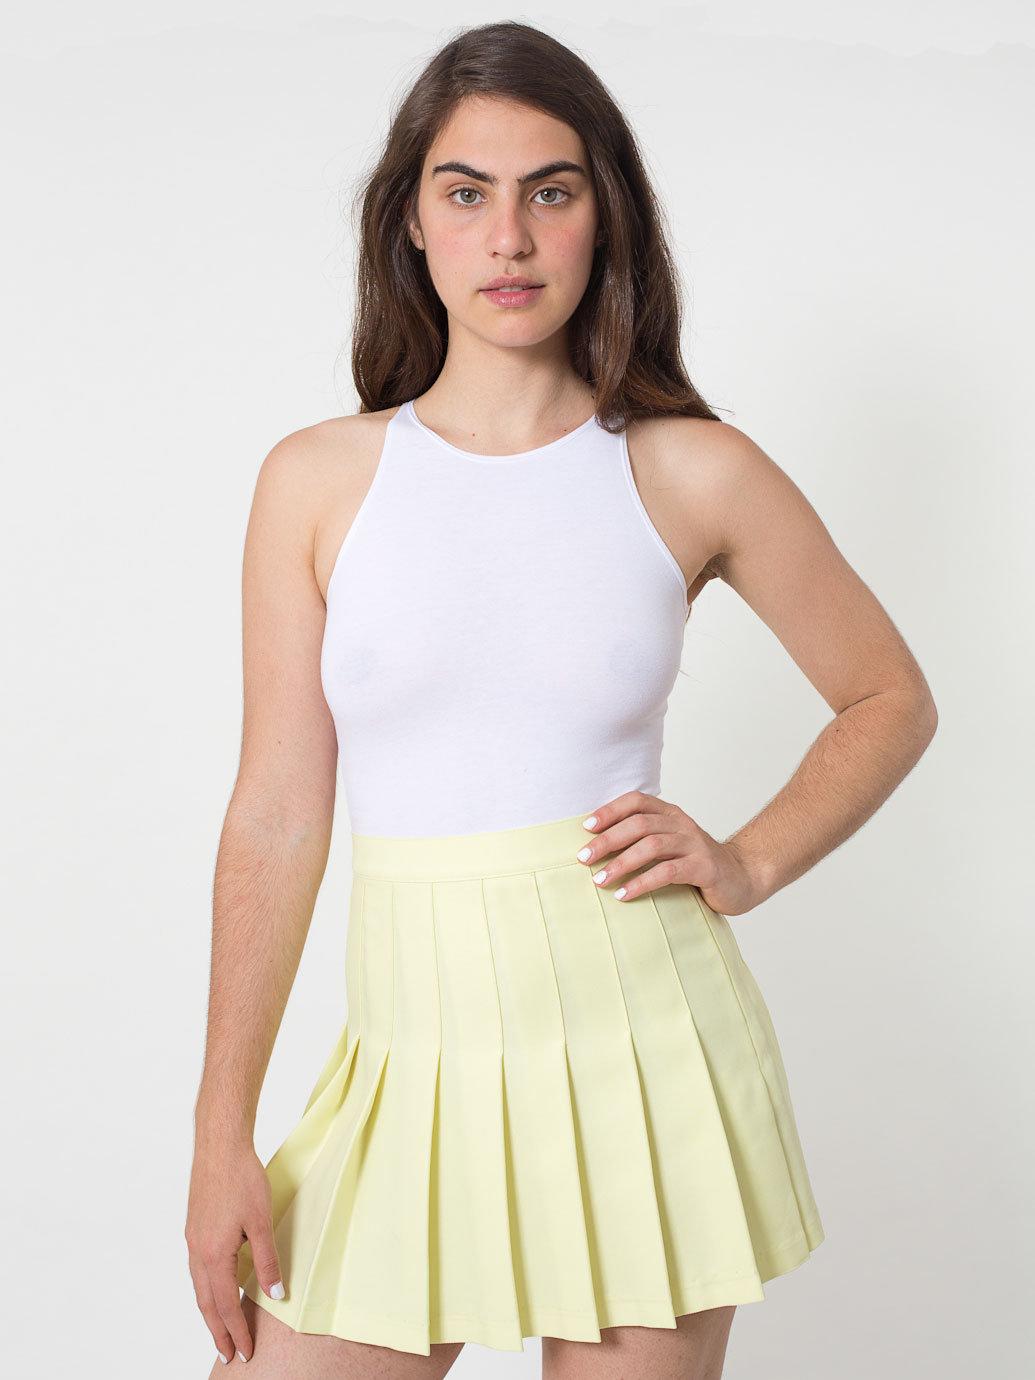 Tennis Skirt | American Apparel